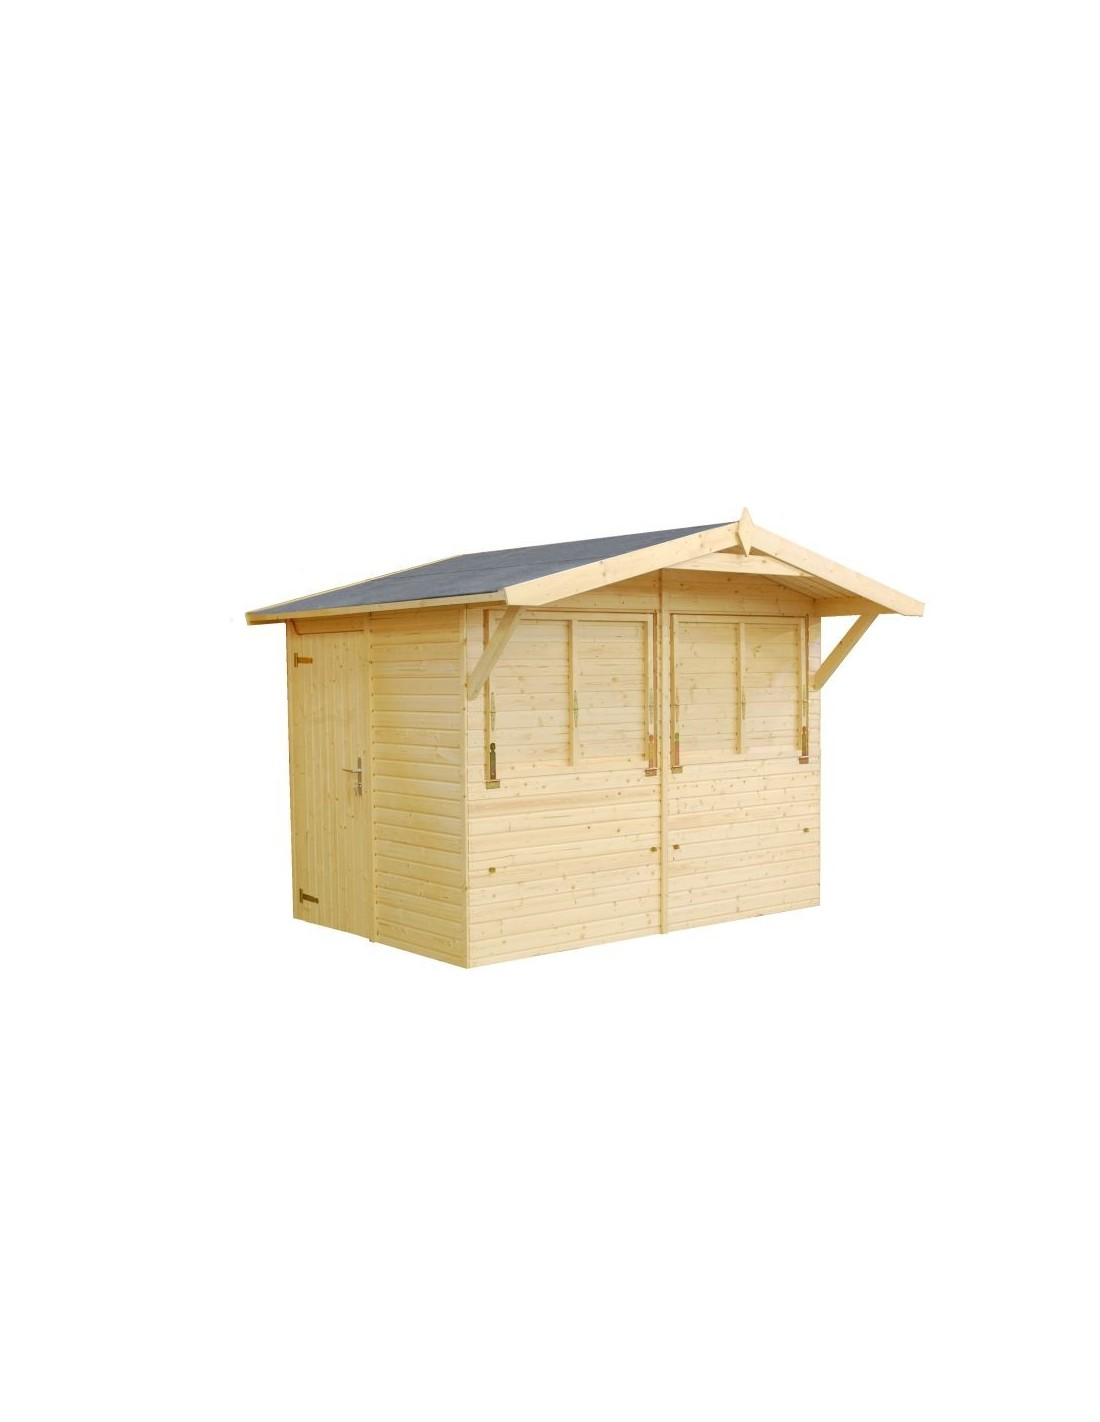 Abri de jardin stella 5 2 m style buvette bois massif 16 mm for Kioscos de madera baratos